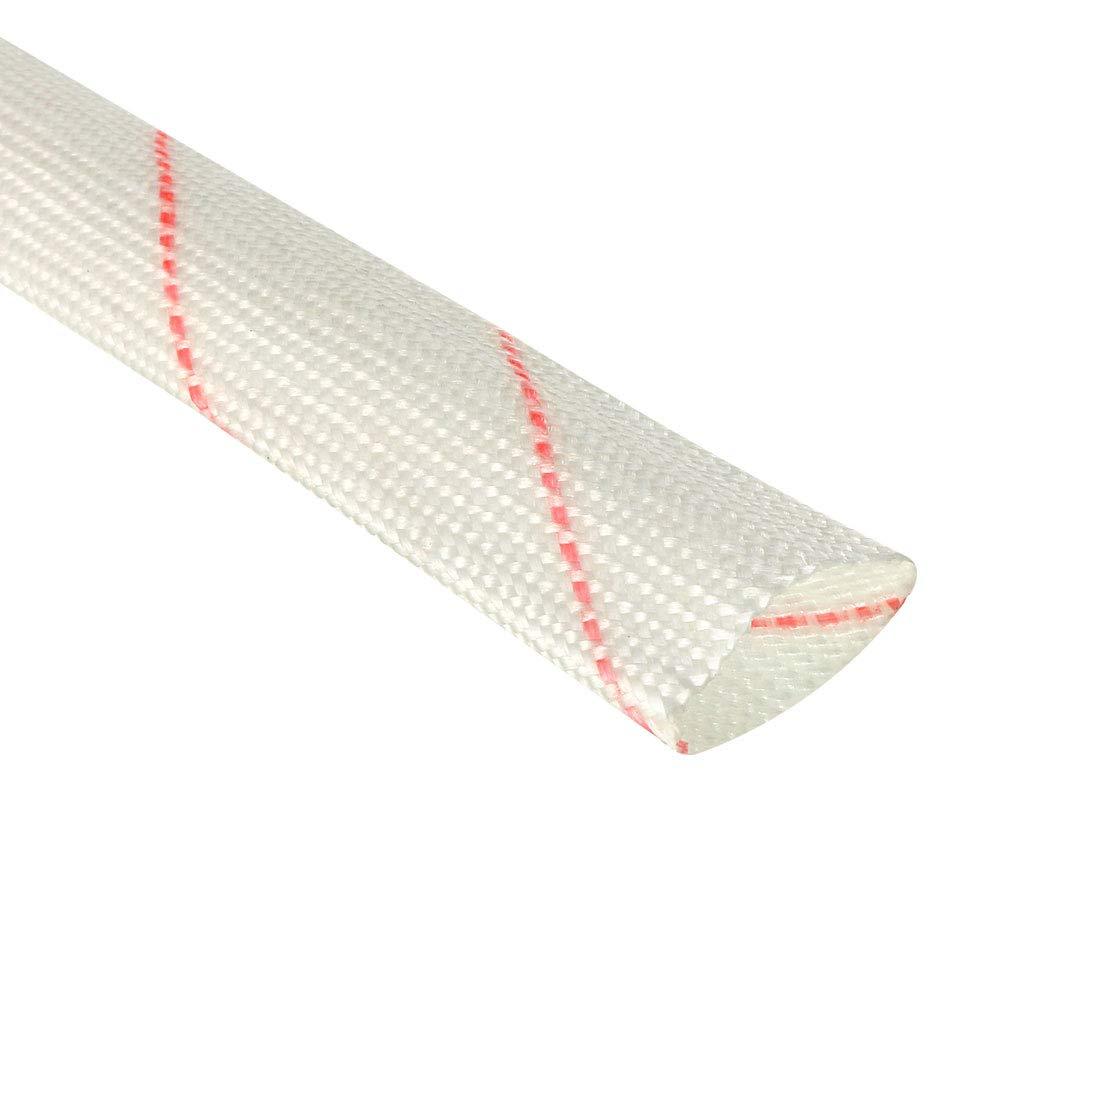 ID x 3ft Adjustable High Tempurtaure Shield Sleeving Pipe 3//8-inch uxcell Fiberglass Heat Shield Sleeve 10mm